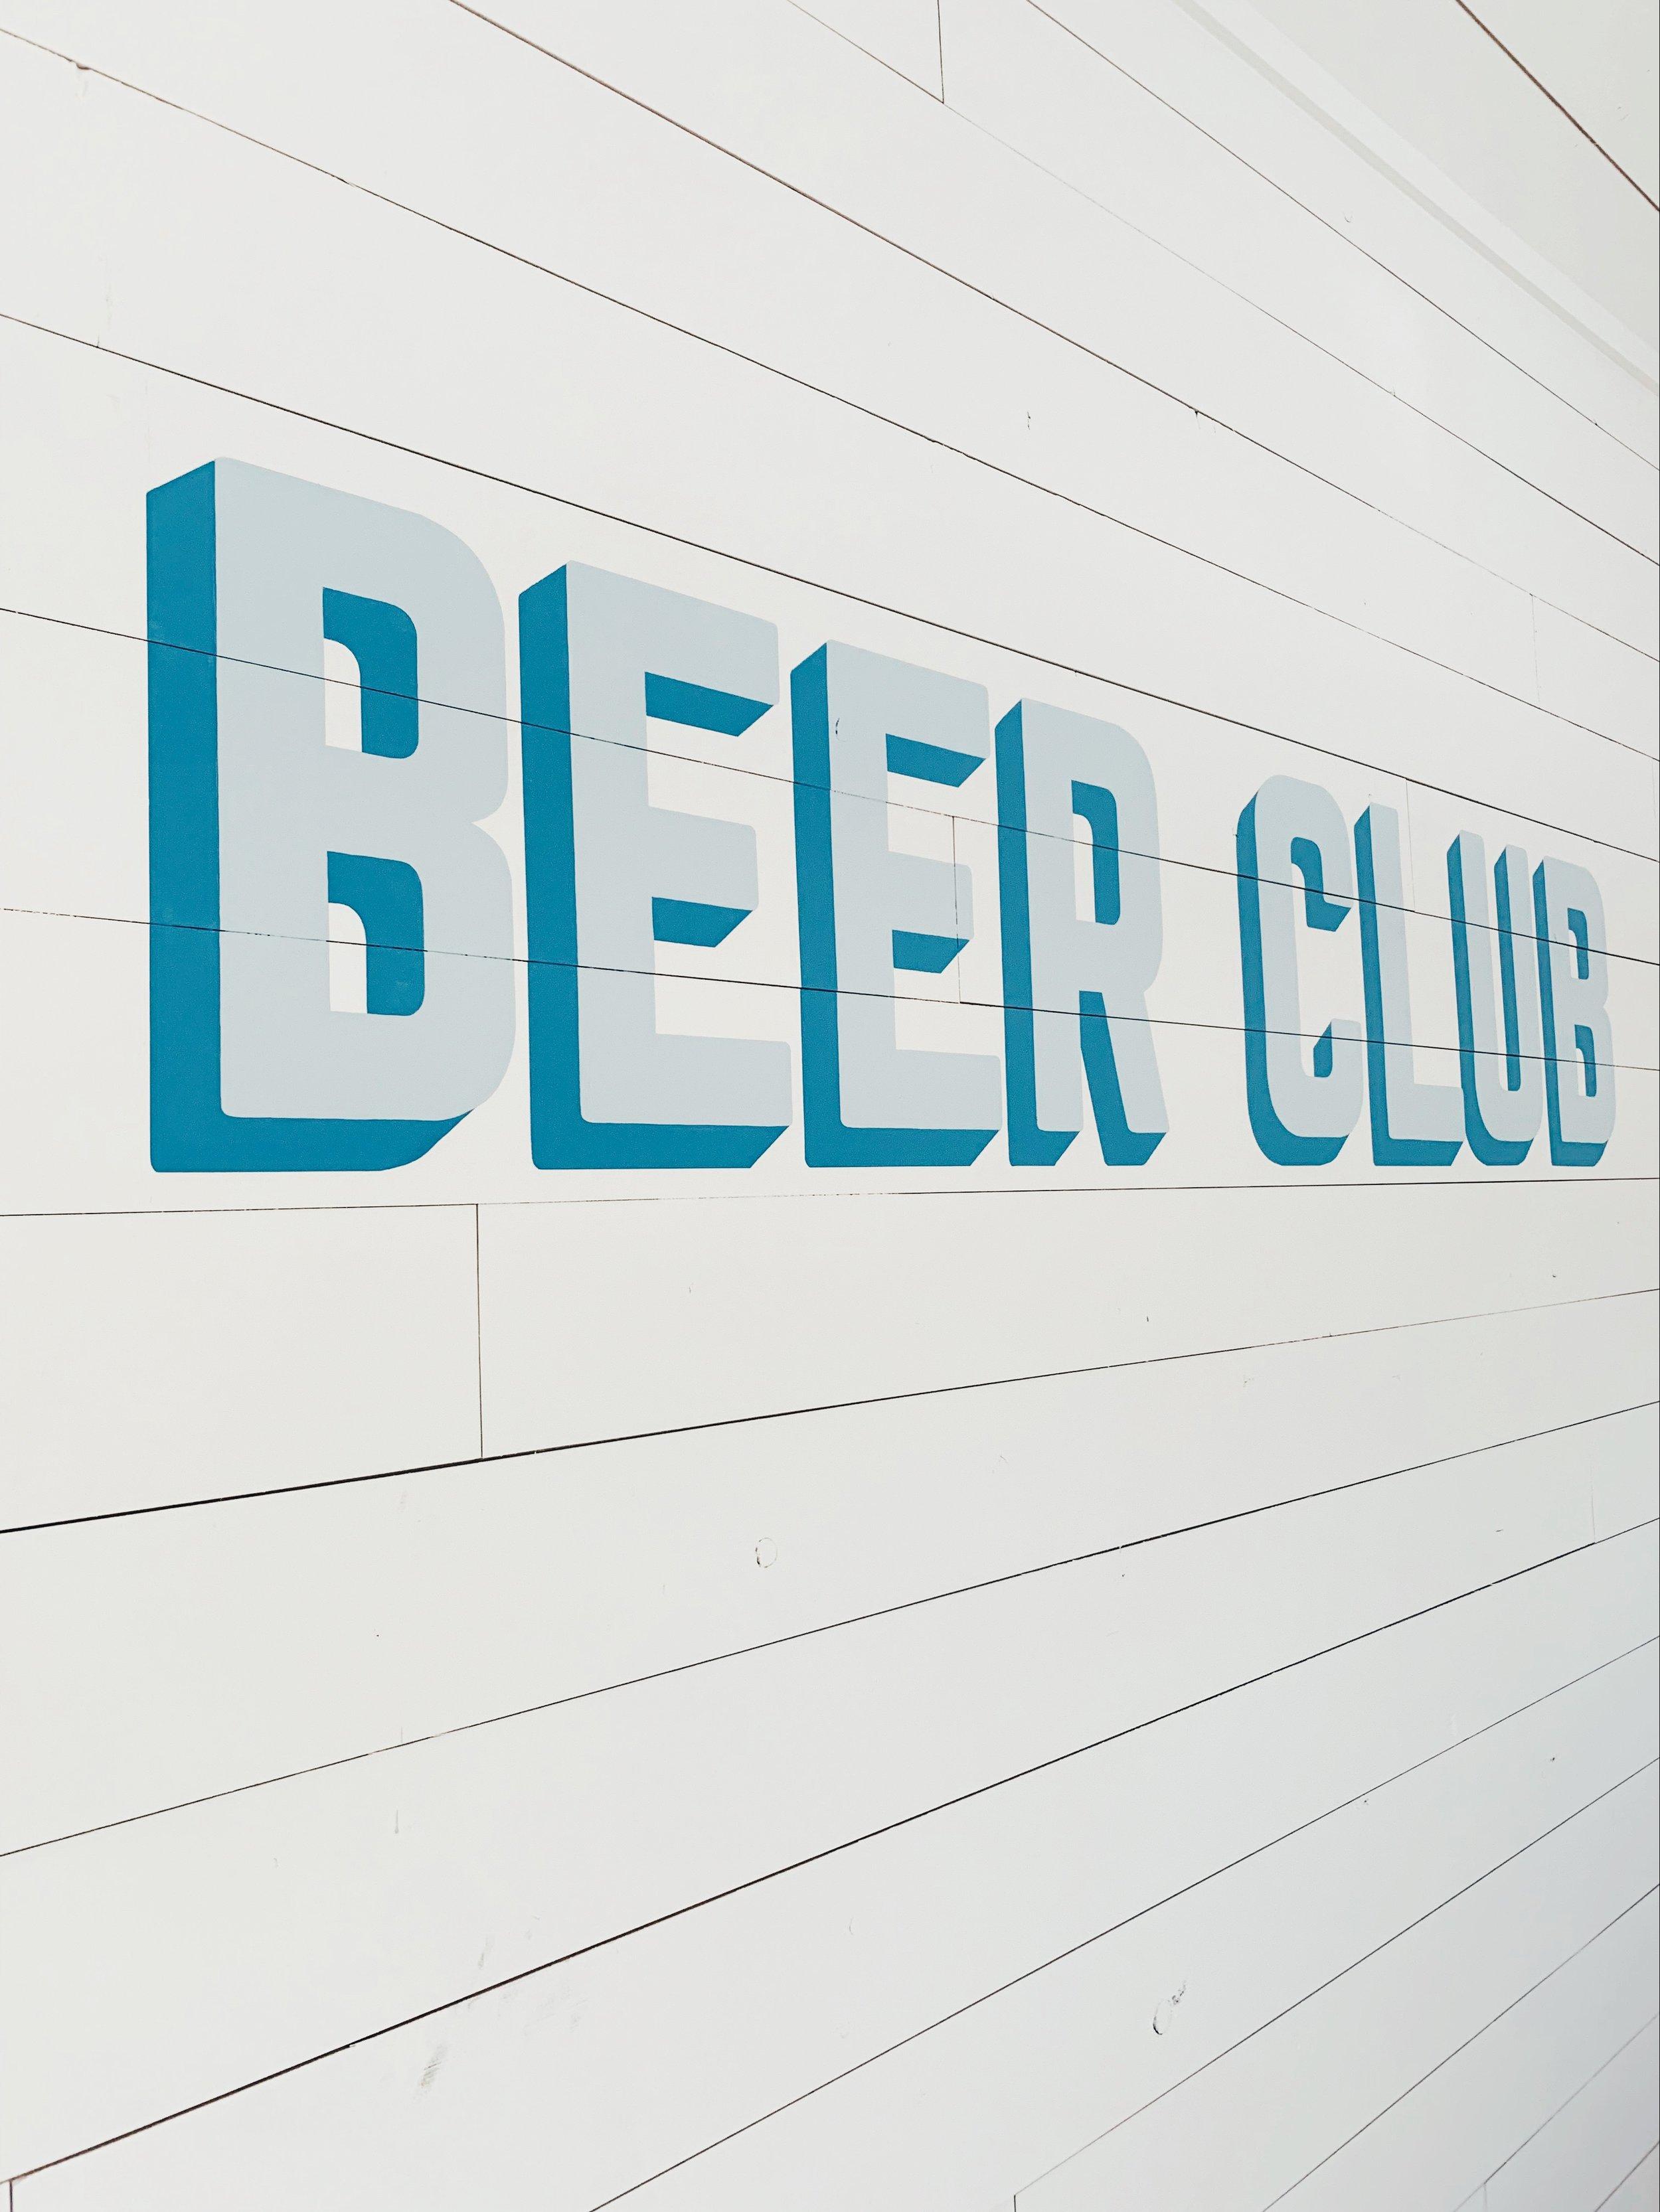 beerclub.JPG